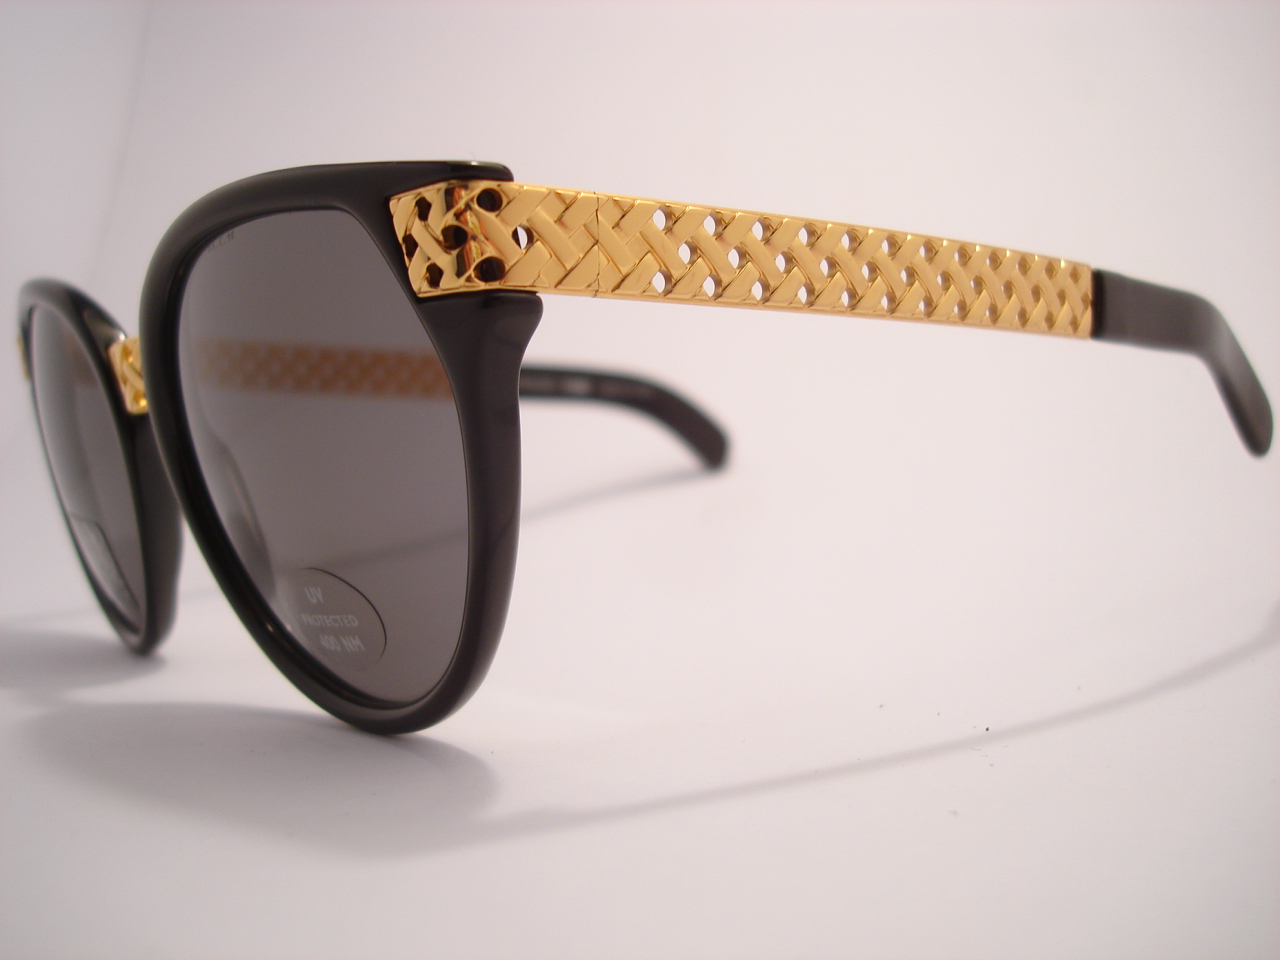 8cc8ac58636 Gianfranco Ferre Sunglasses 2013 « Heritage Malta